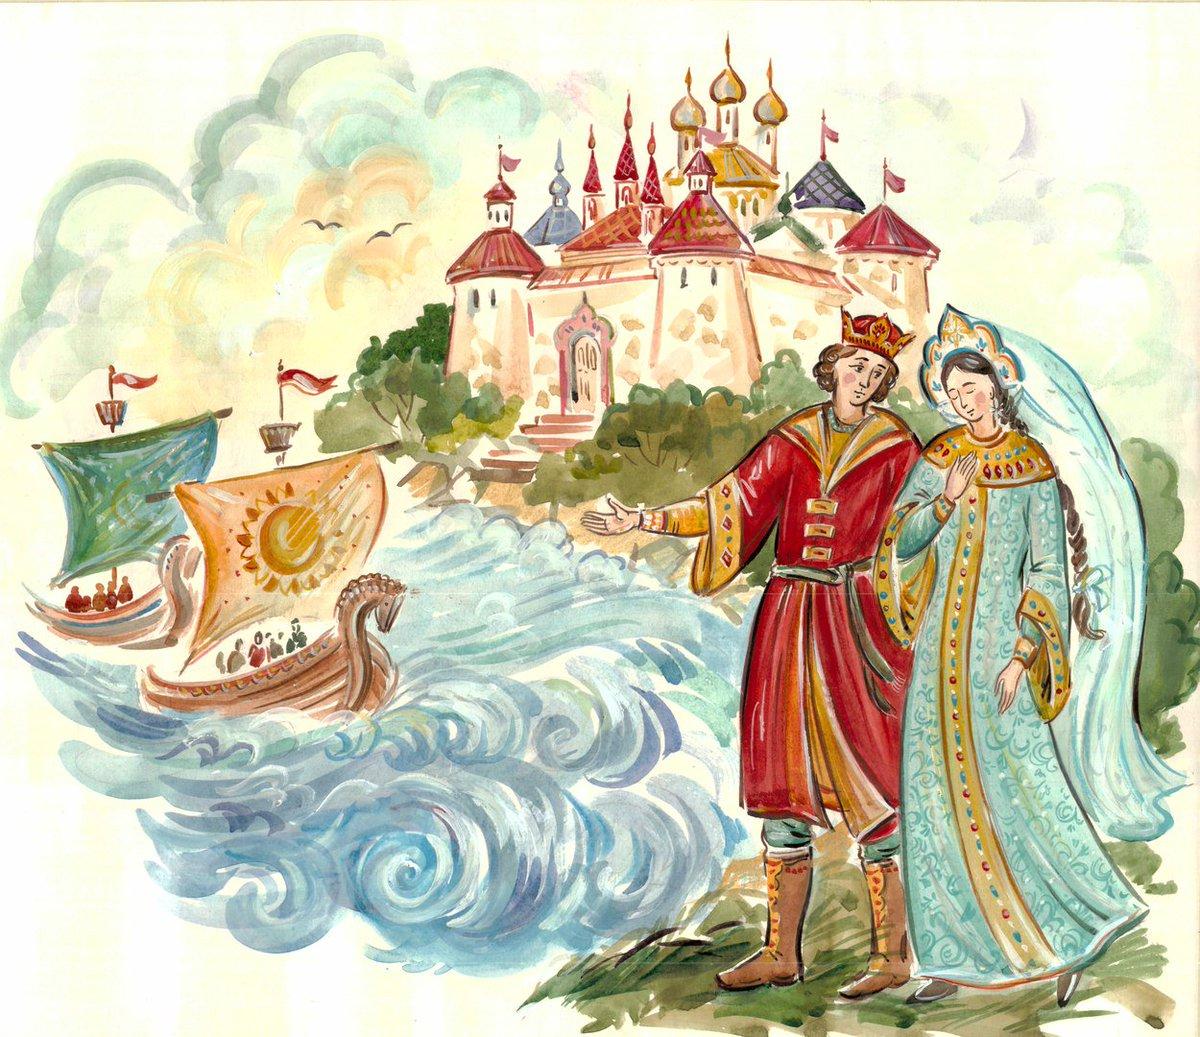 Днем, открытки к сказке о царе салтане